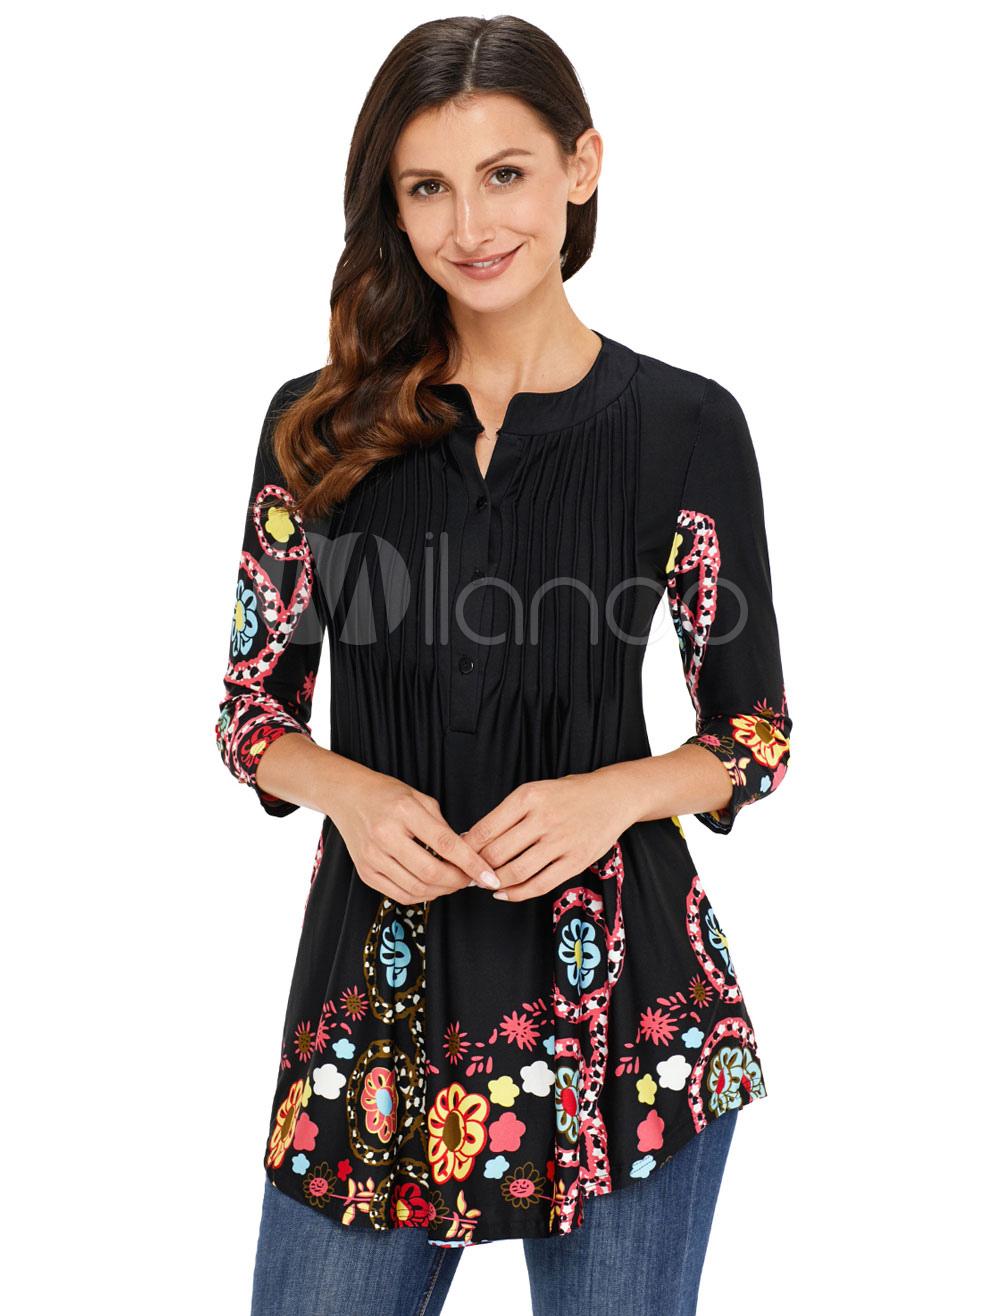 7abb55088d2fa Blusa estampada con cuello redondo de manga larga y blusas negras para  mujer-No.